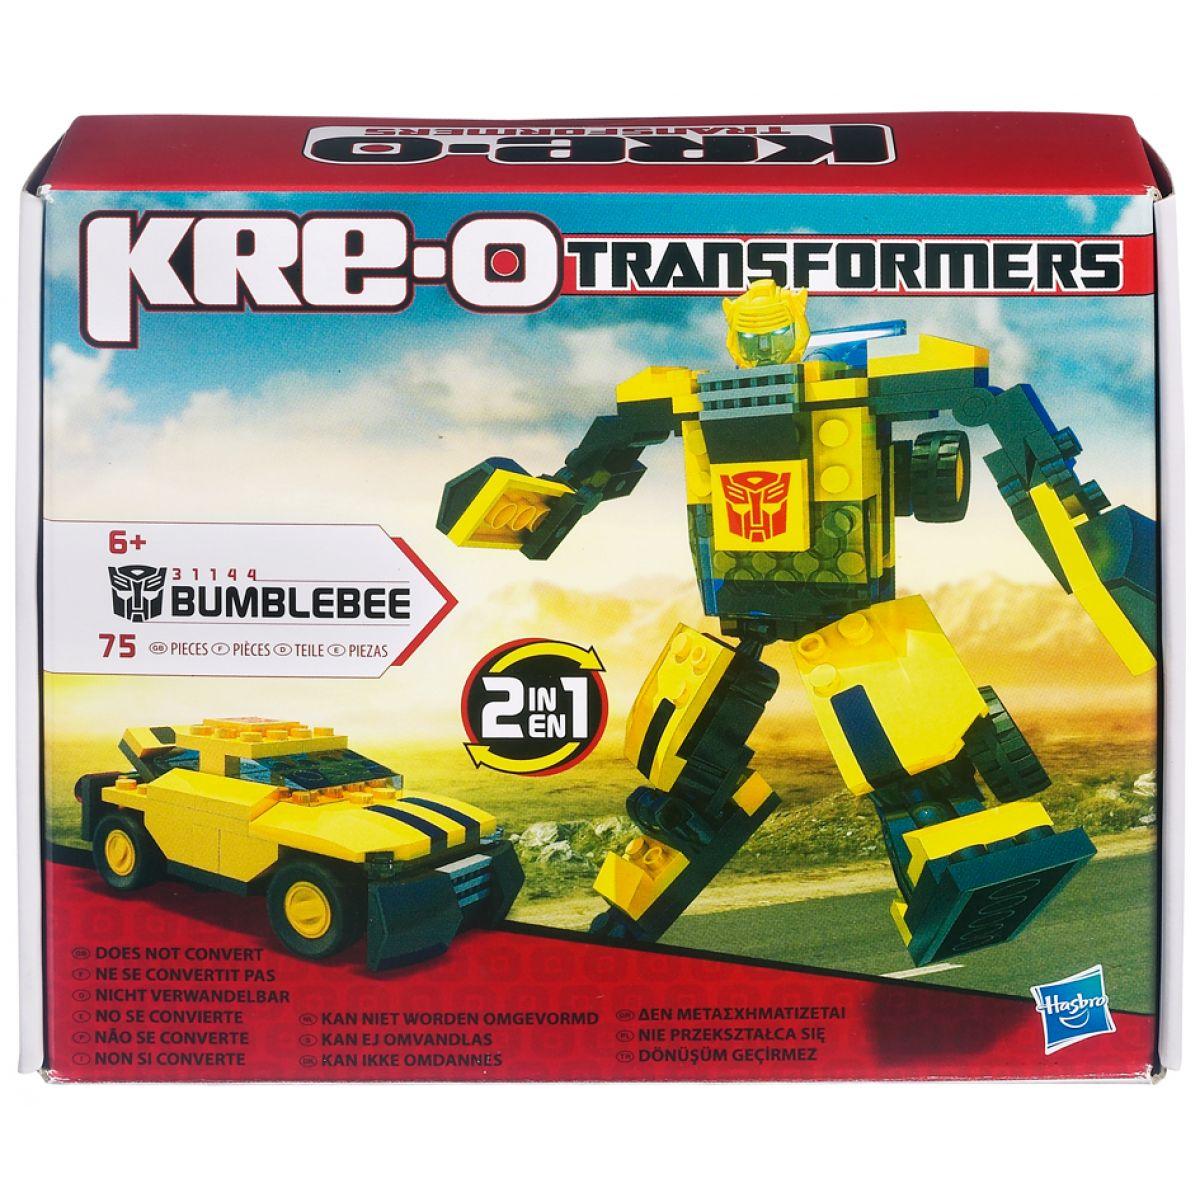 KRE-O Transformers stavebnice Bumblebee Hasbro 31144